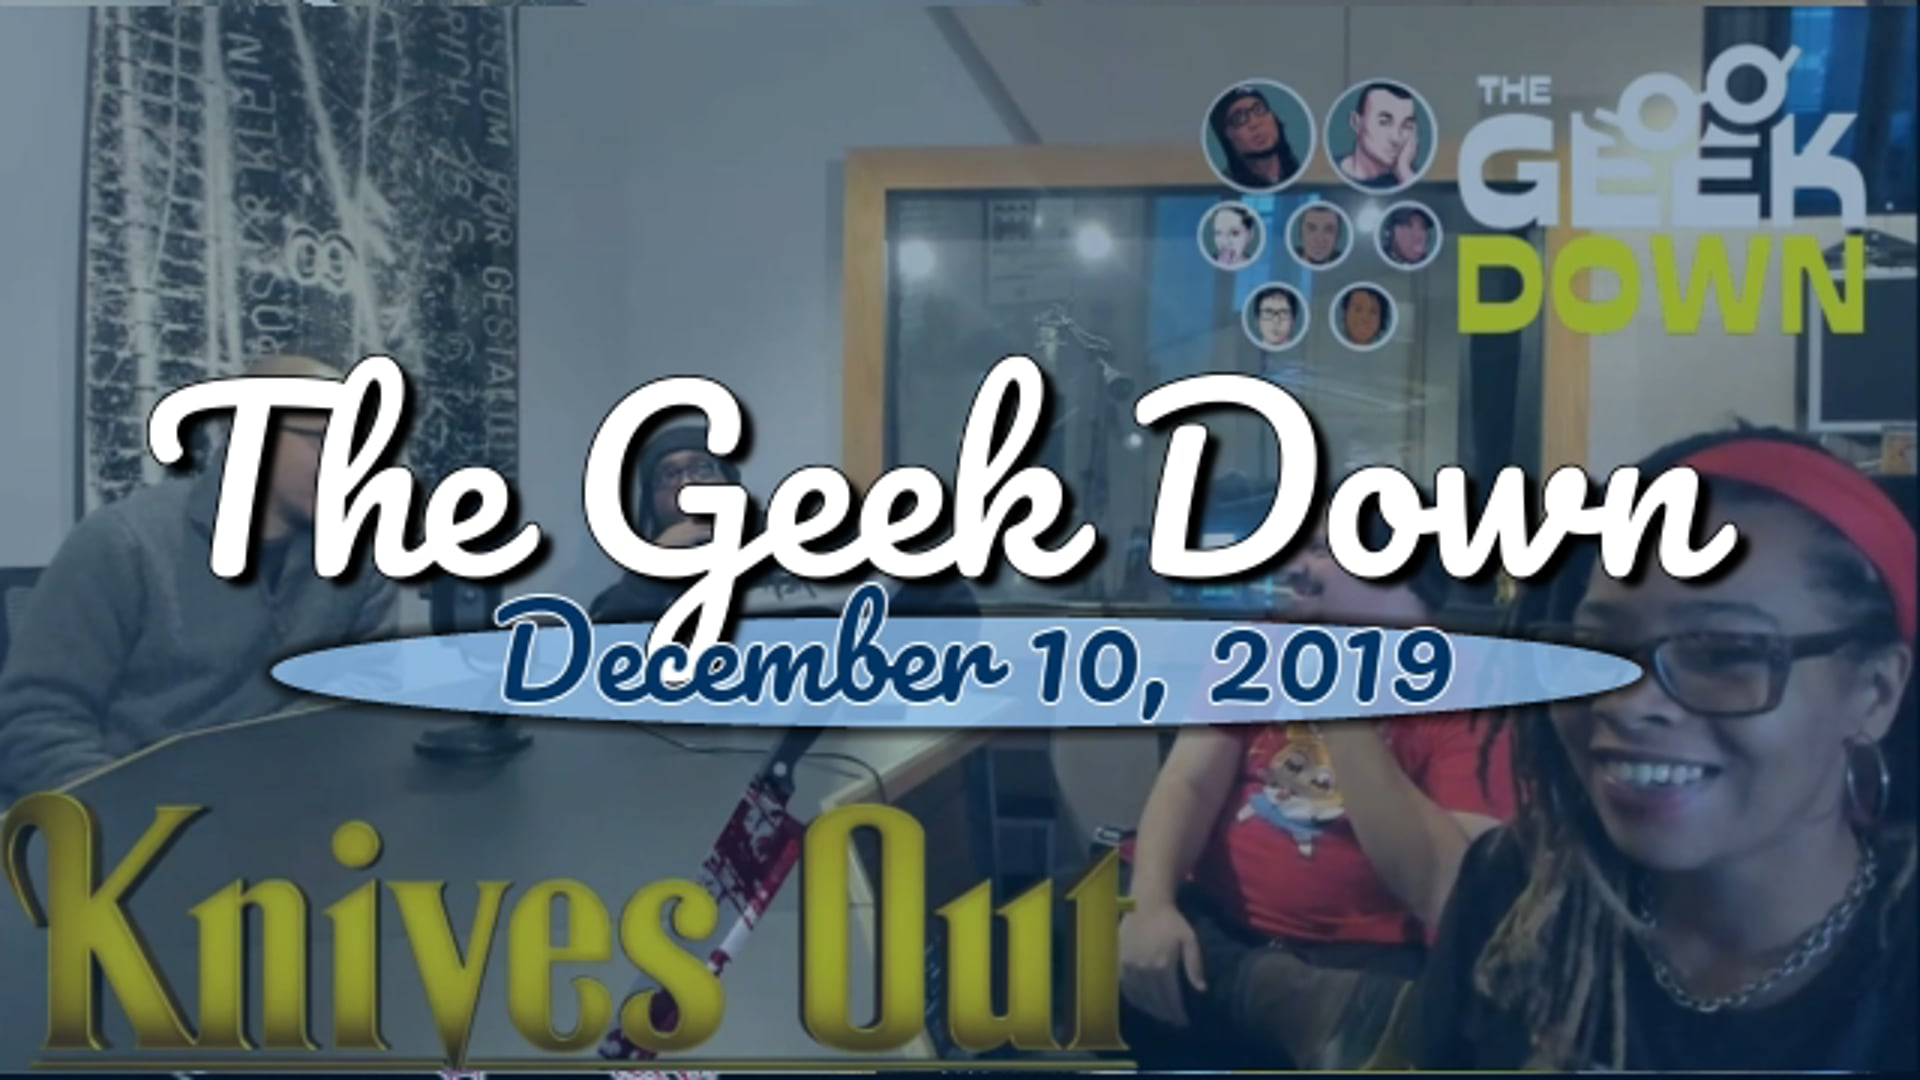 Geek Down 12-10-19 - Knives Out, BDSM, The Irishman, Black Hammer 45